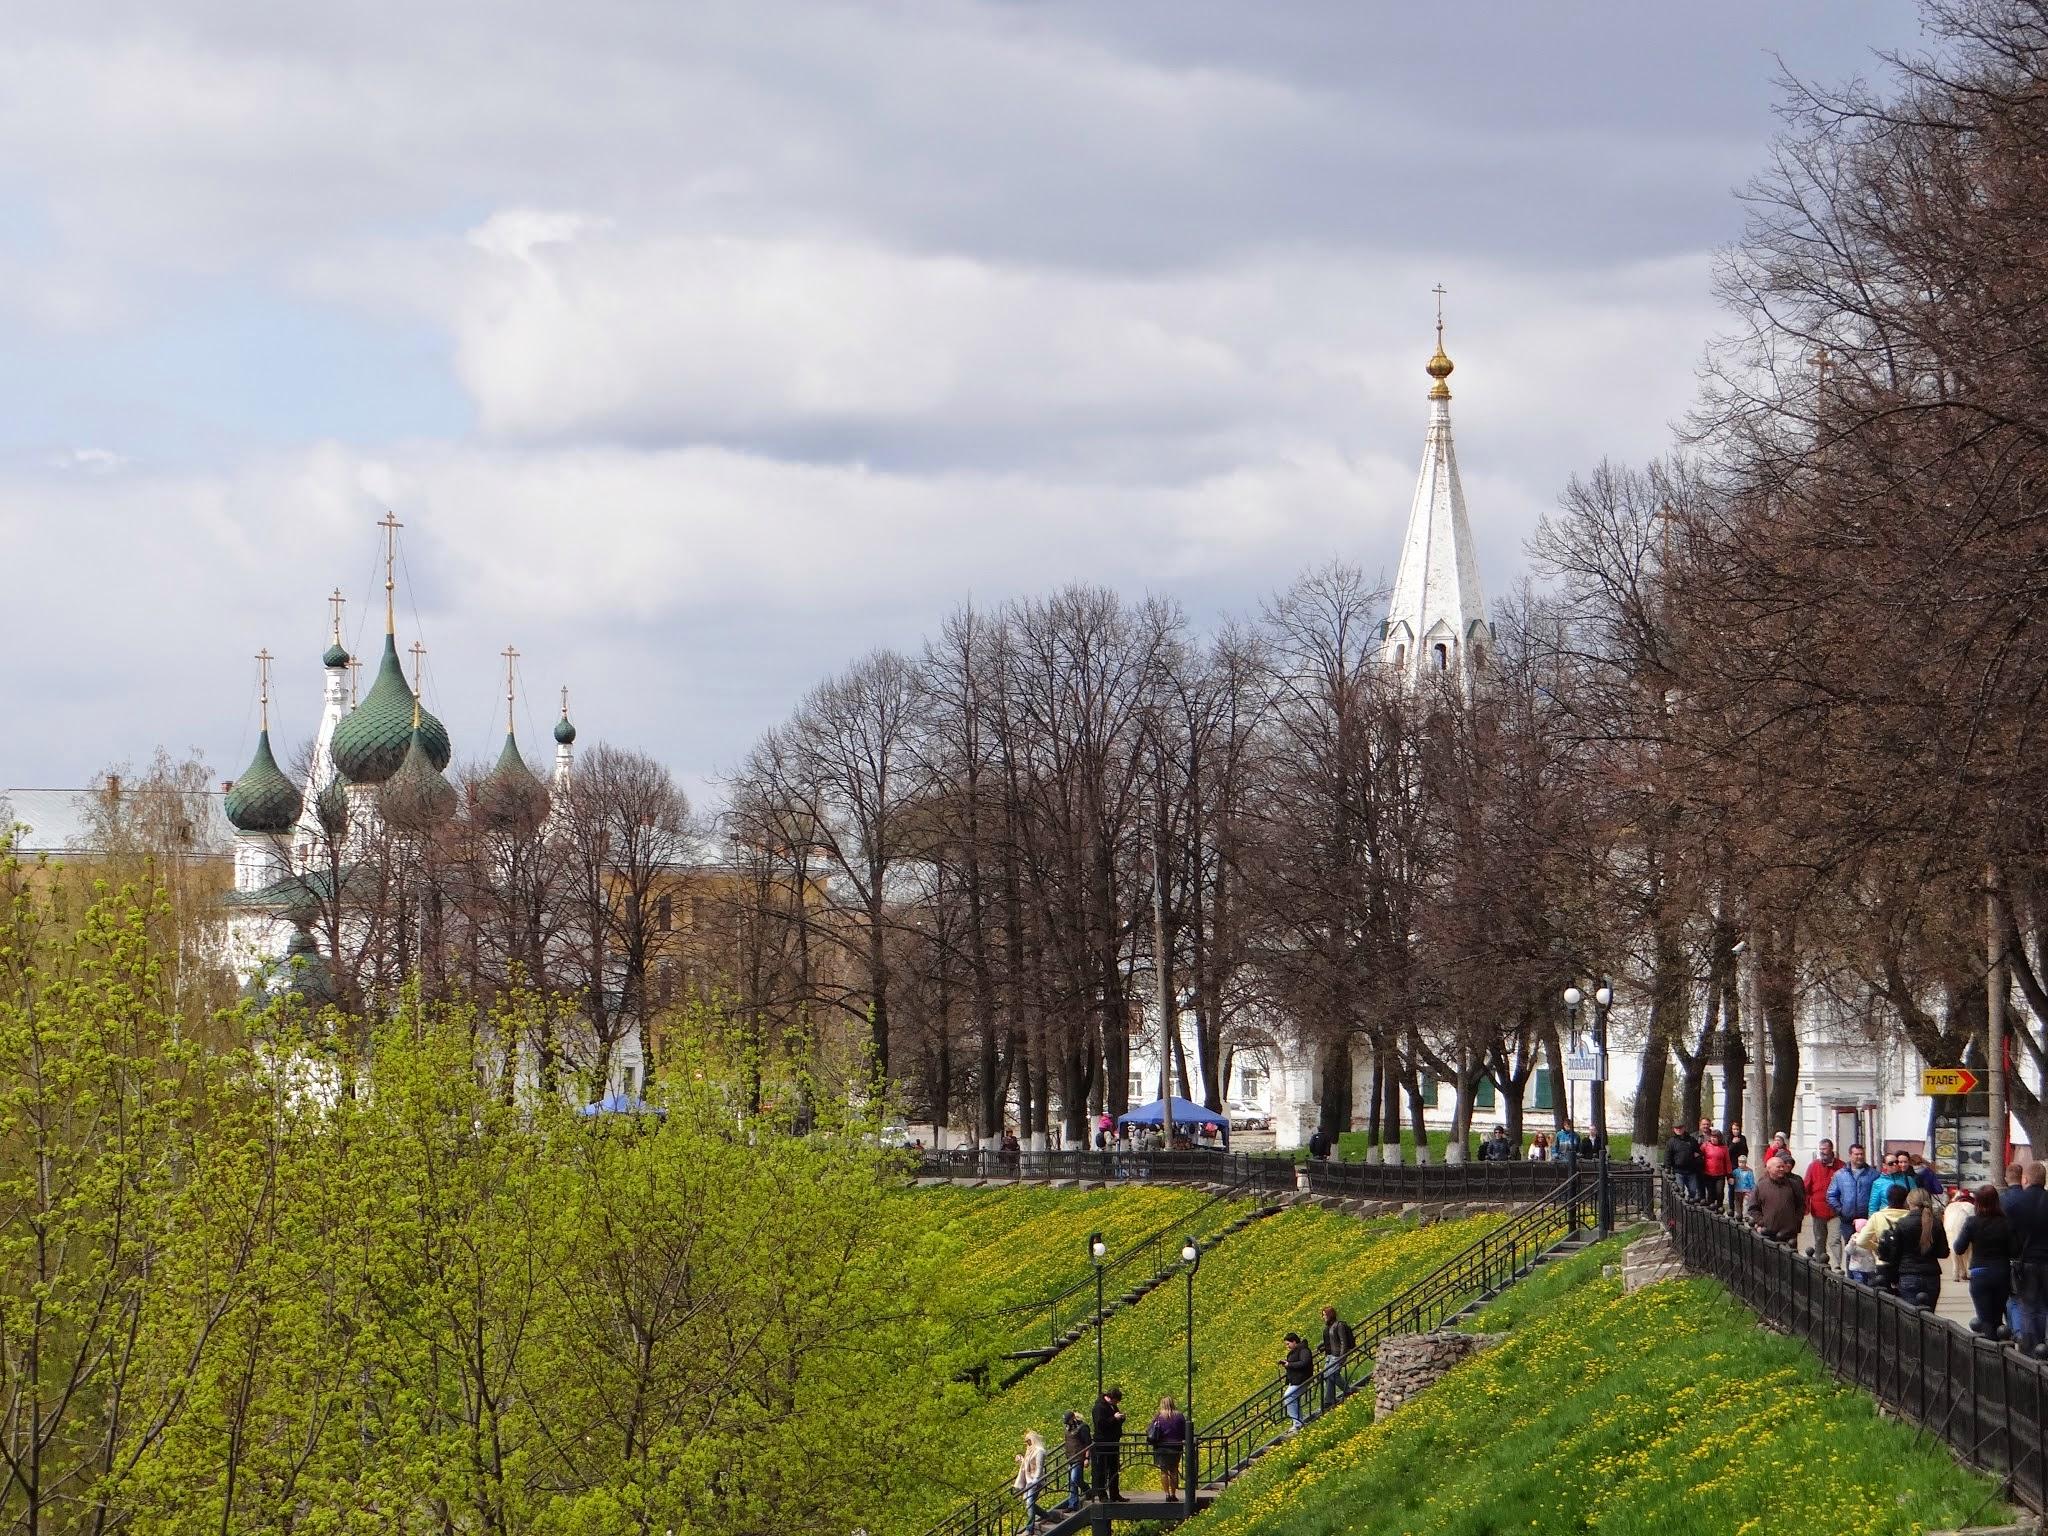 yaroslavl river bank promenade.JPG